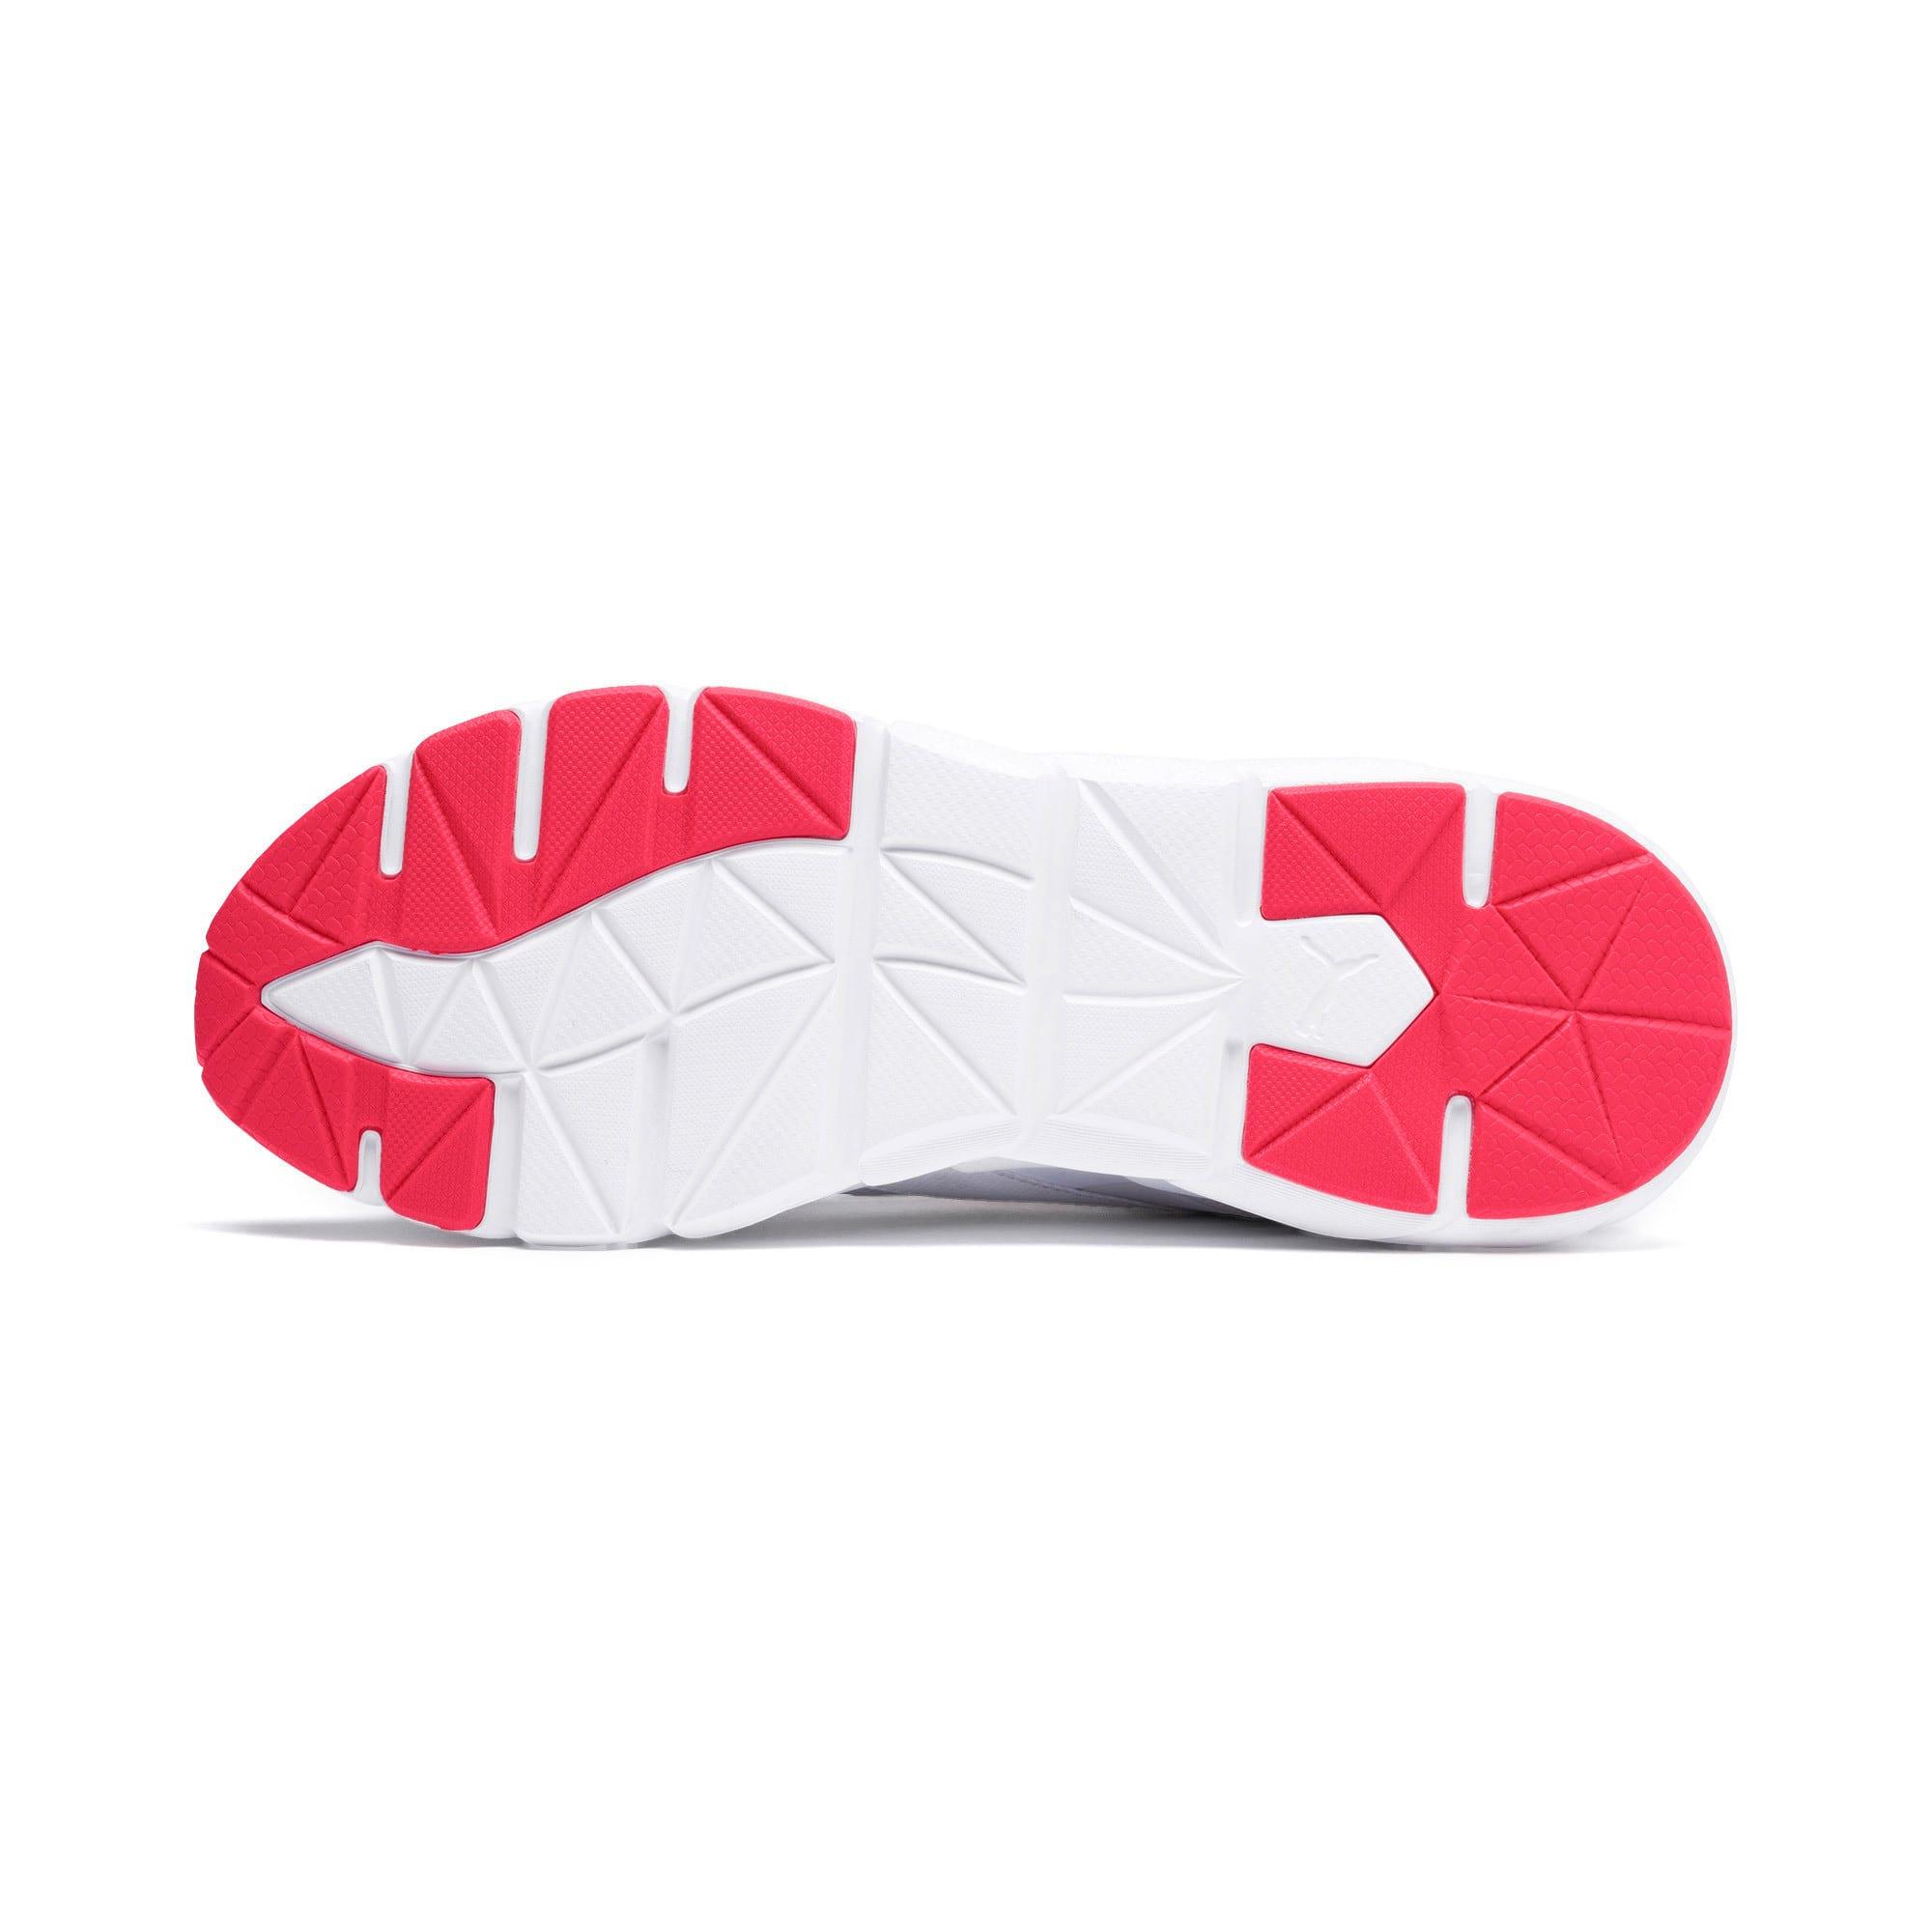 Thumbnail 5 of Weave XT Women's Training Shoes, Puma White-Pink Alert, medium